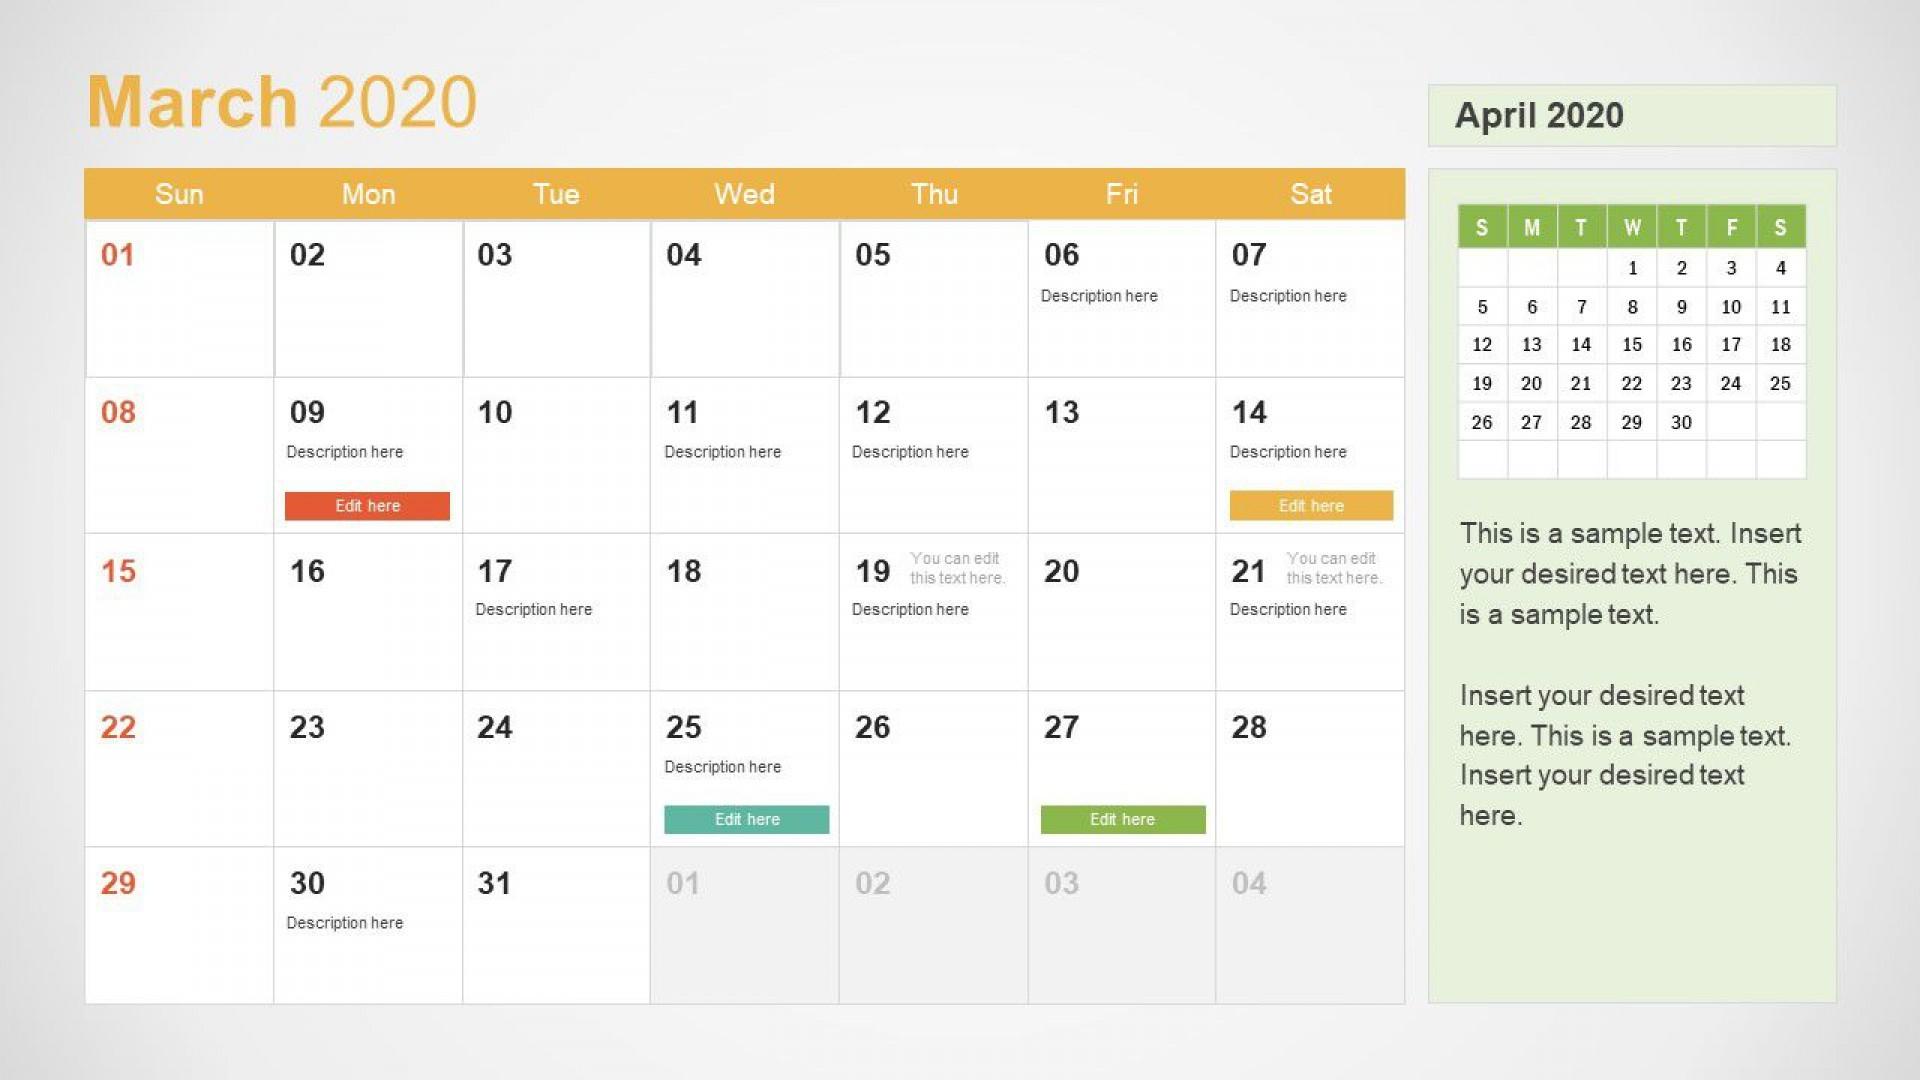 004 Astounding Microsoft Calendar Template 2020 High Def  Publisher Office Free1920